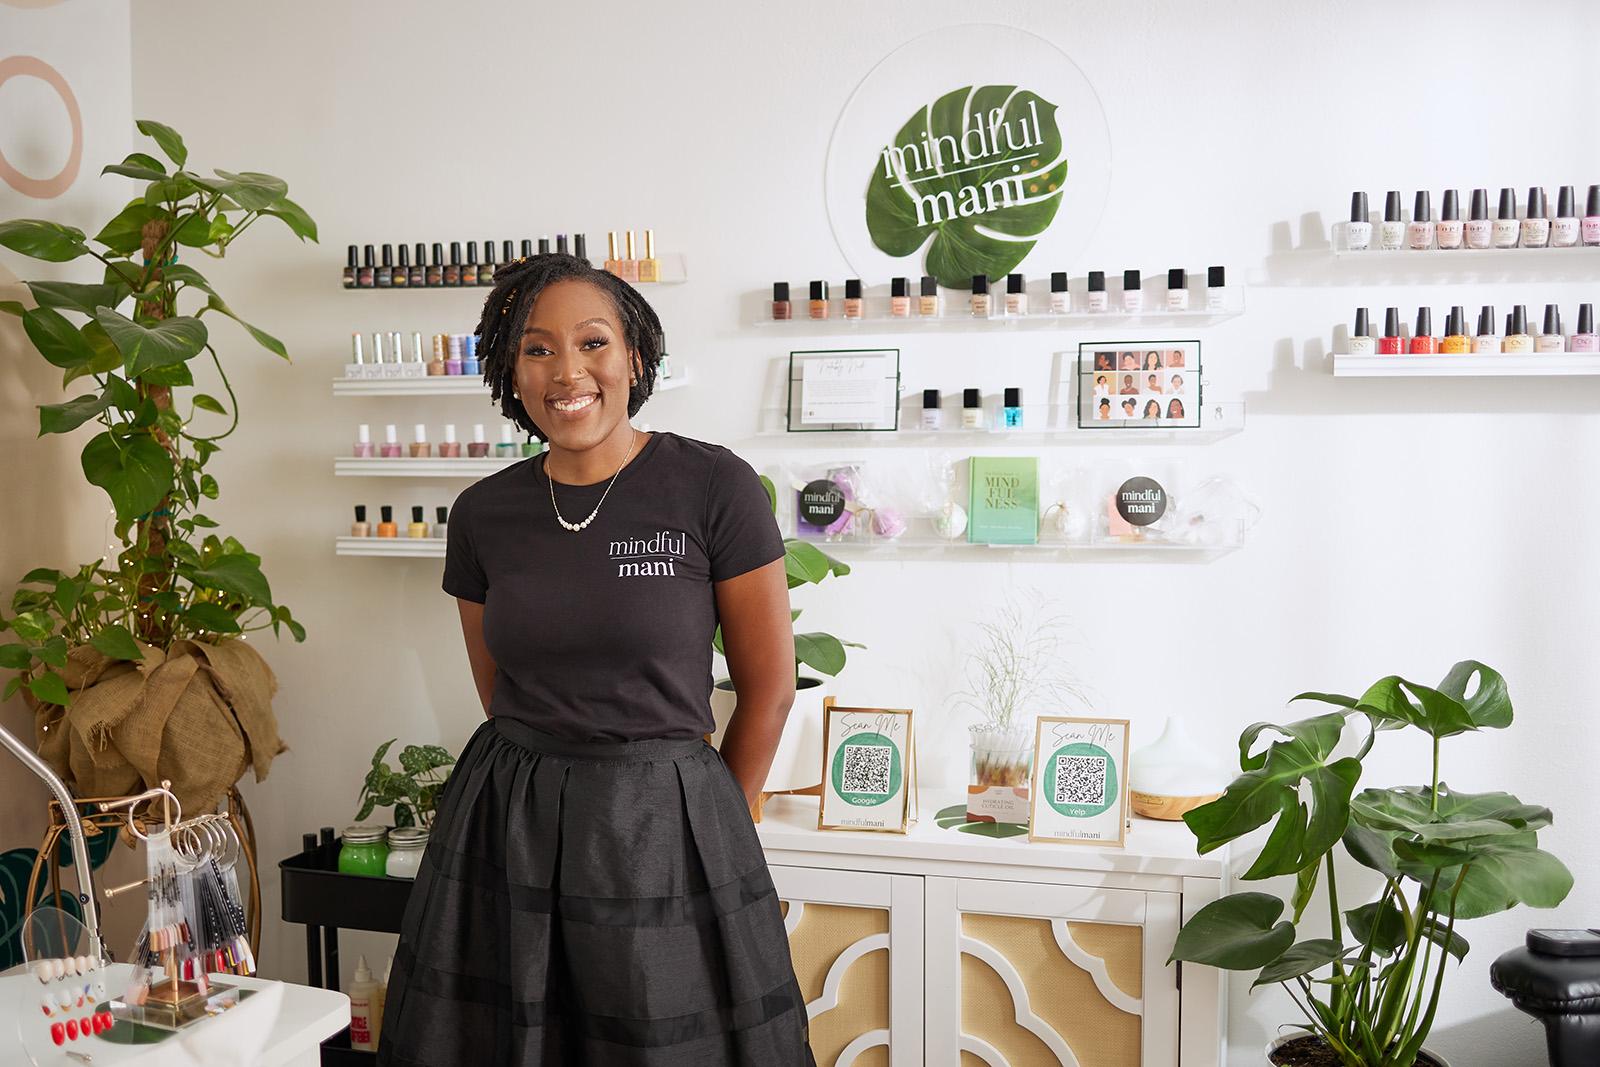 Lauren Johnson, owner of Mindful Mani